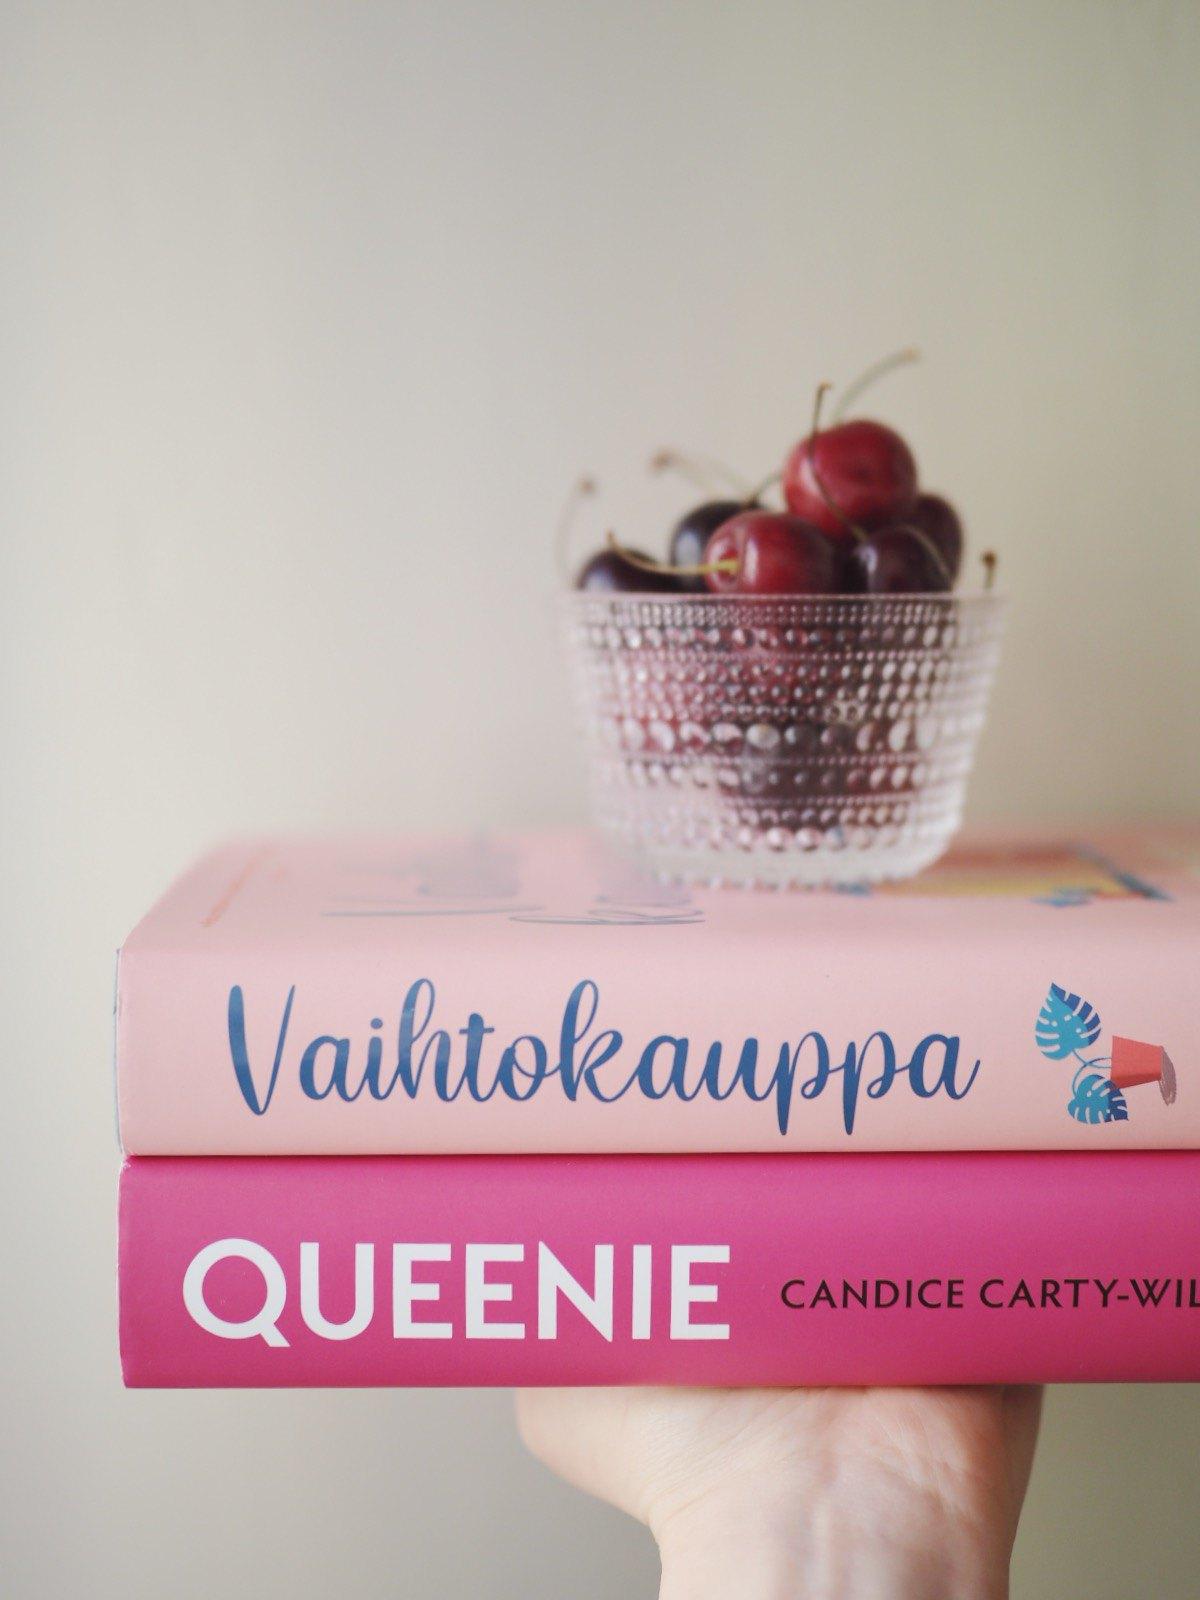 Queenie Vaihtokauppa